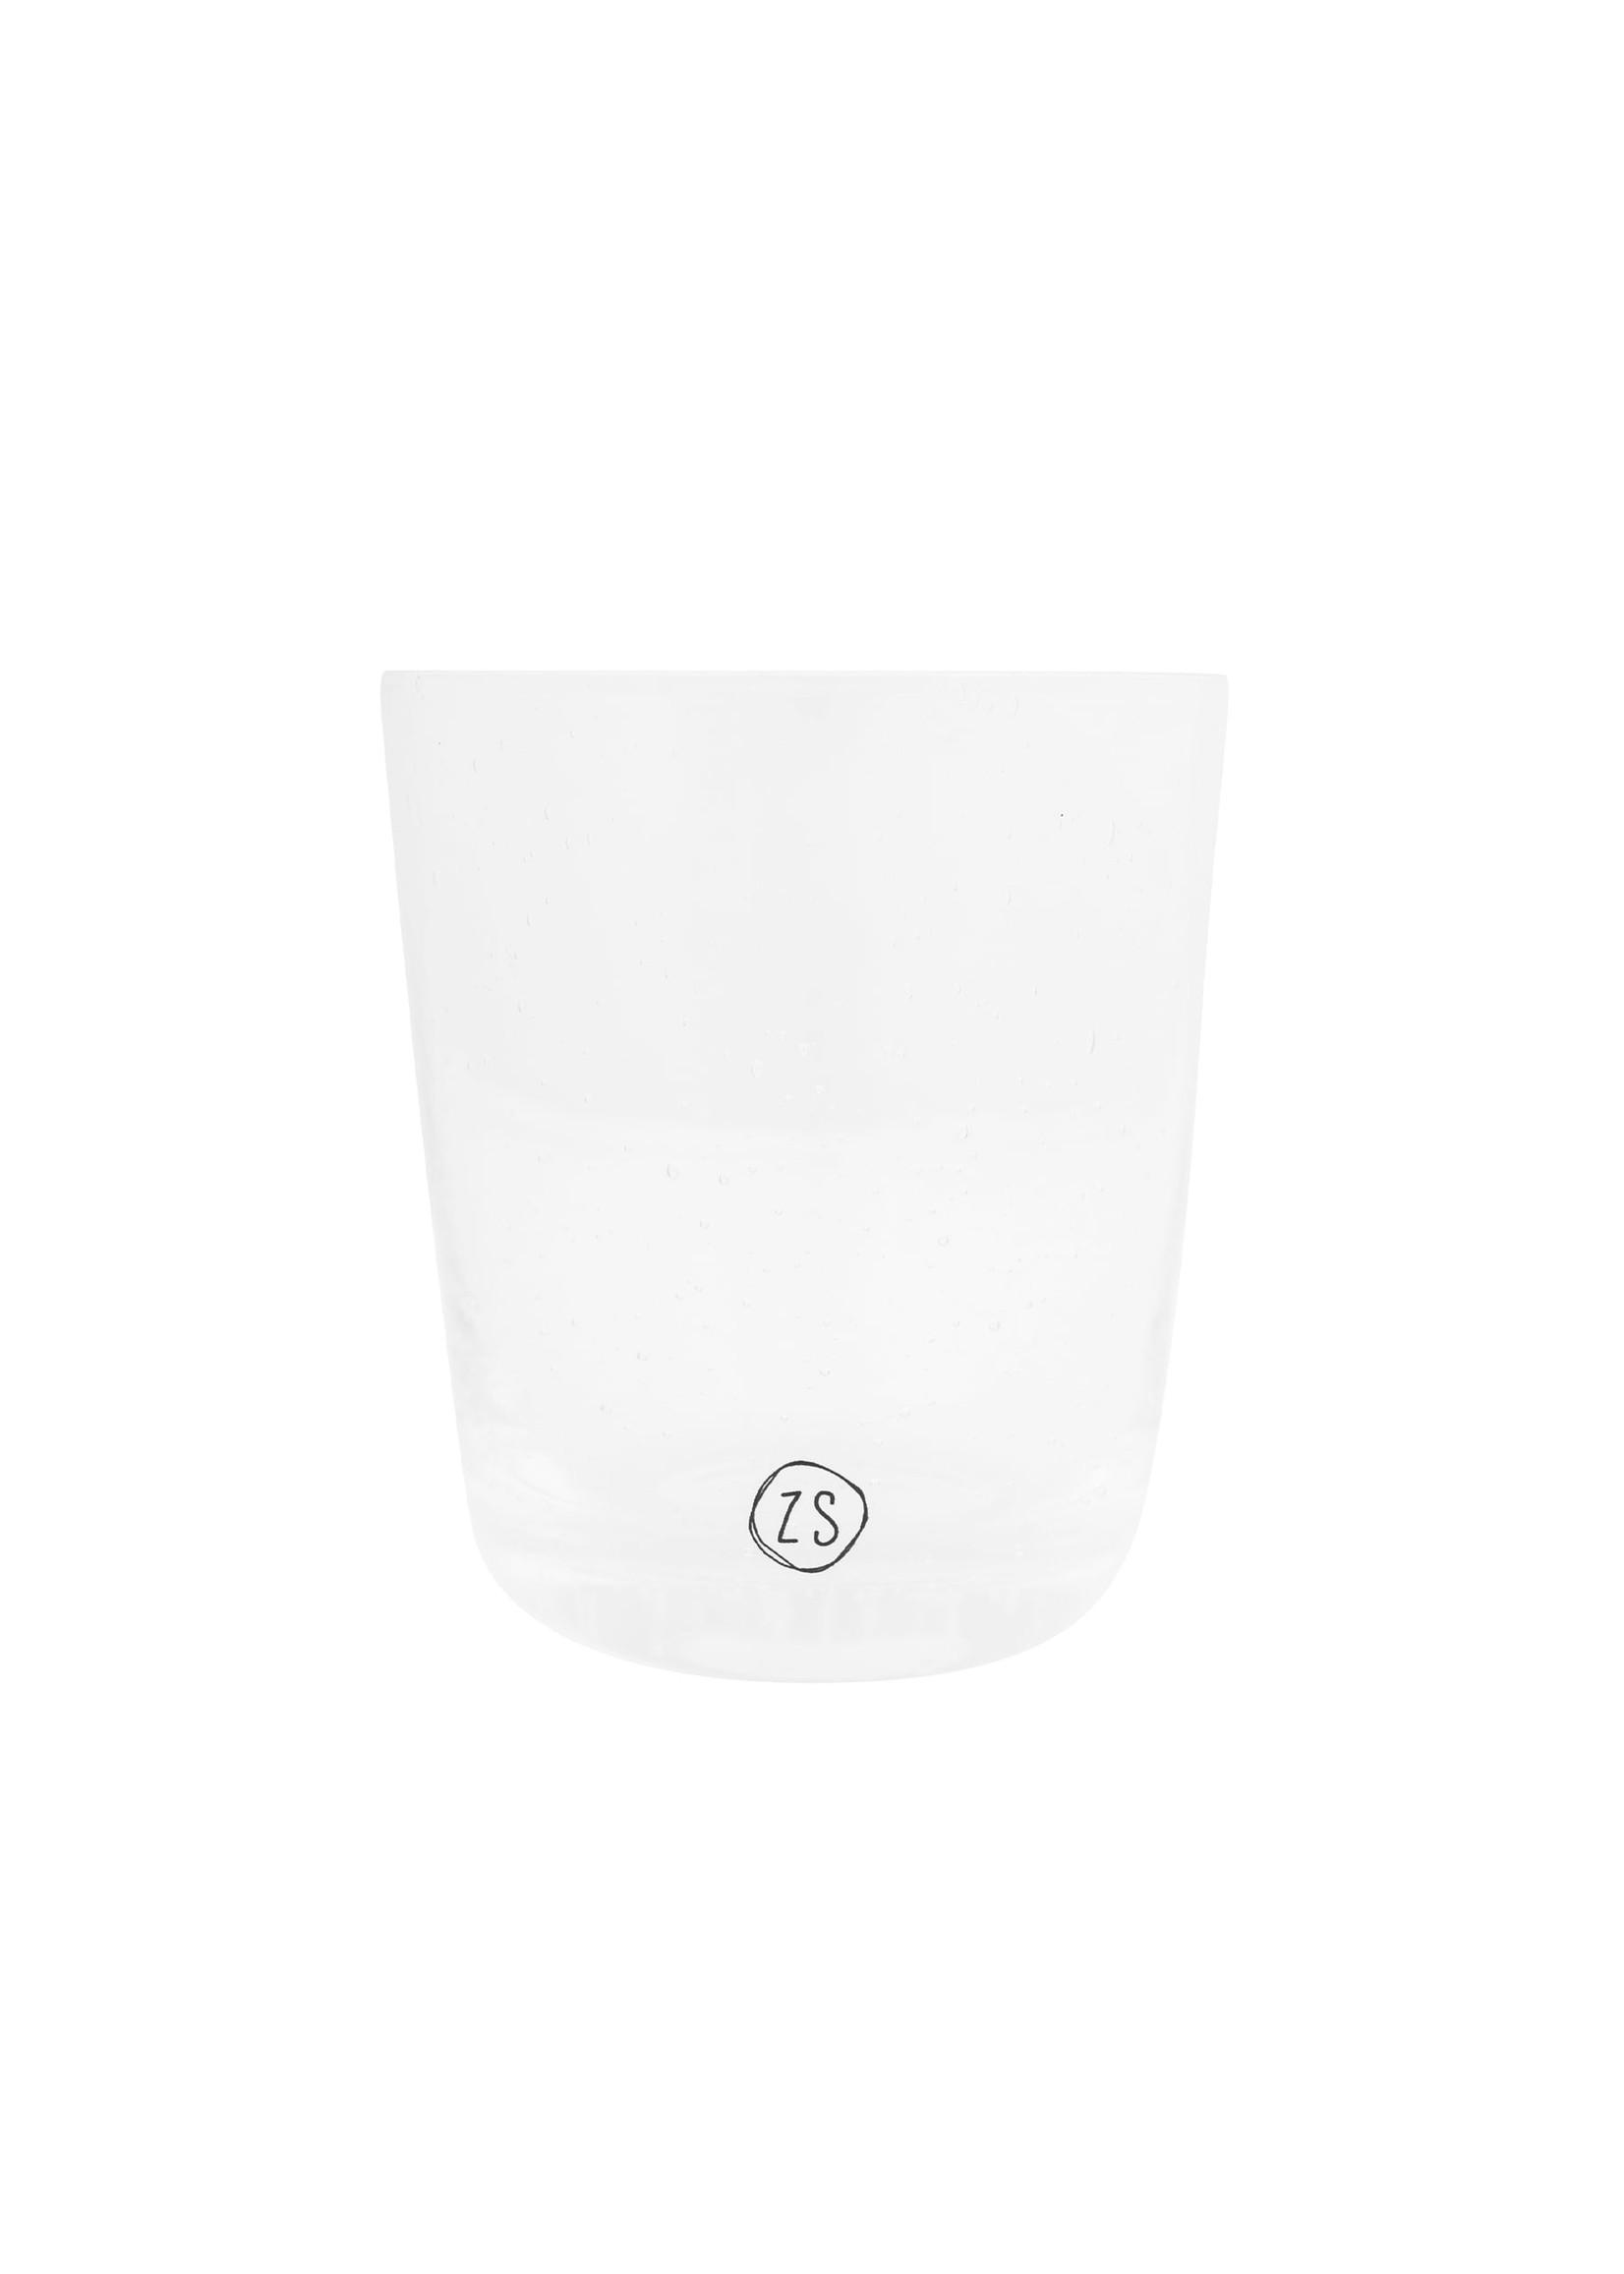 ZUSSS waterglas gerecycled glas